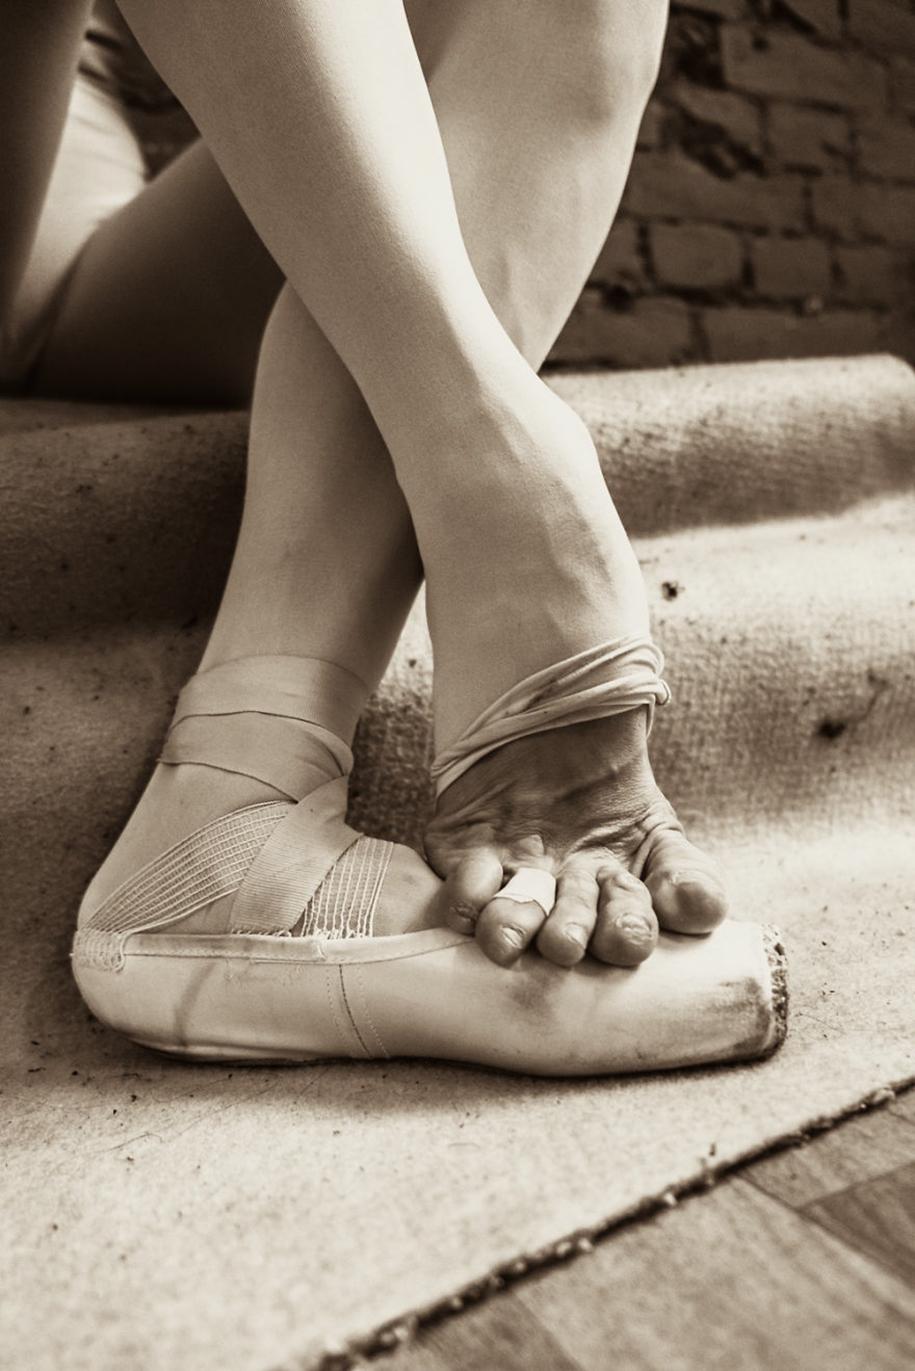 behind-stage-russian-ballet-dancers-photographer-darian-volkova-15